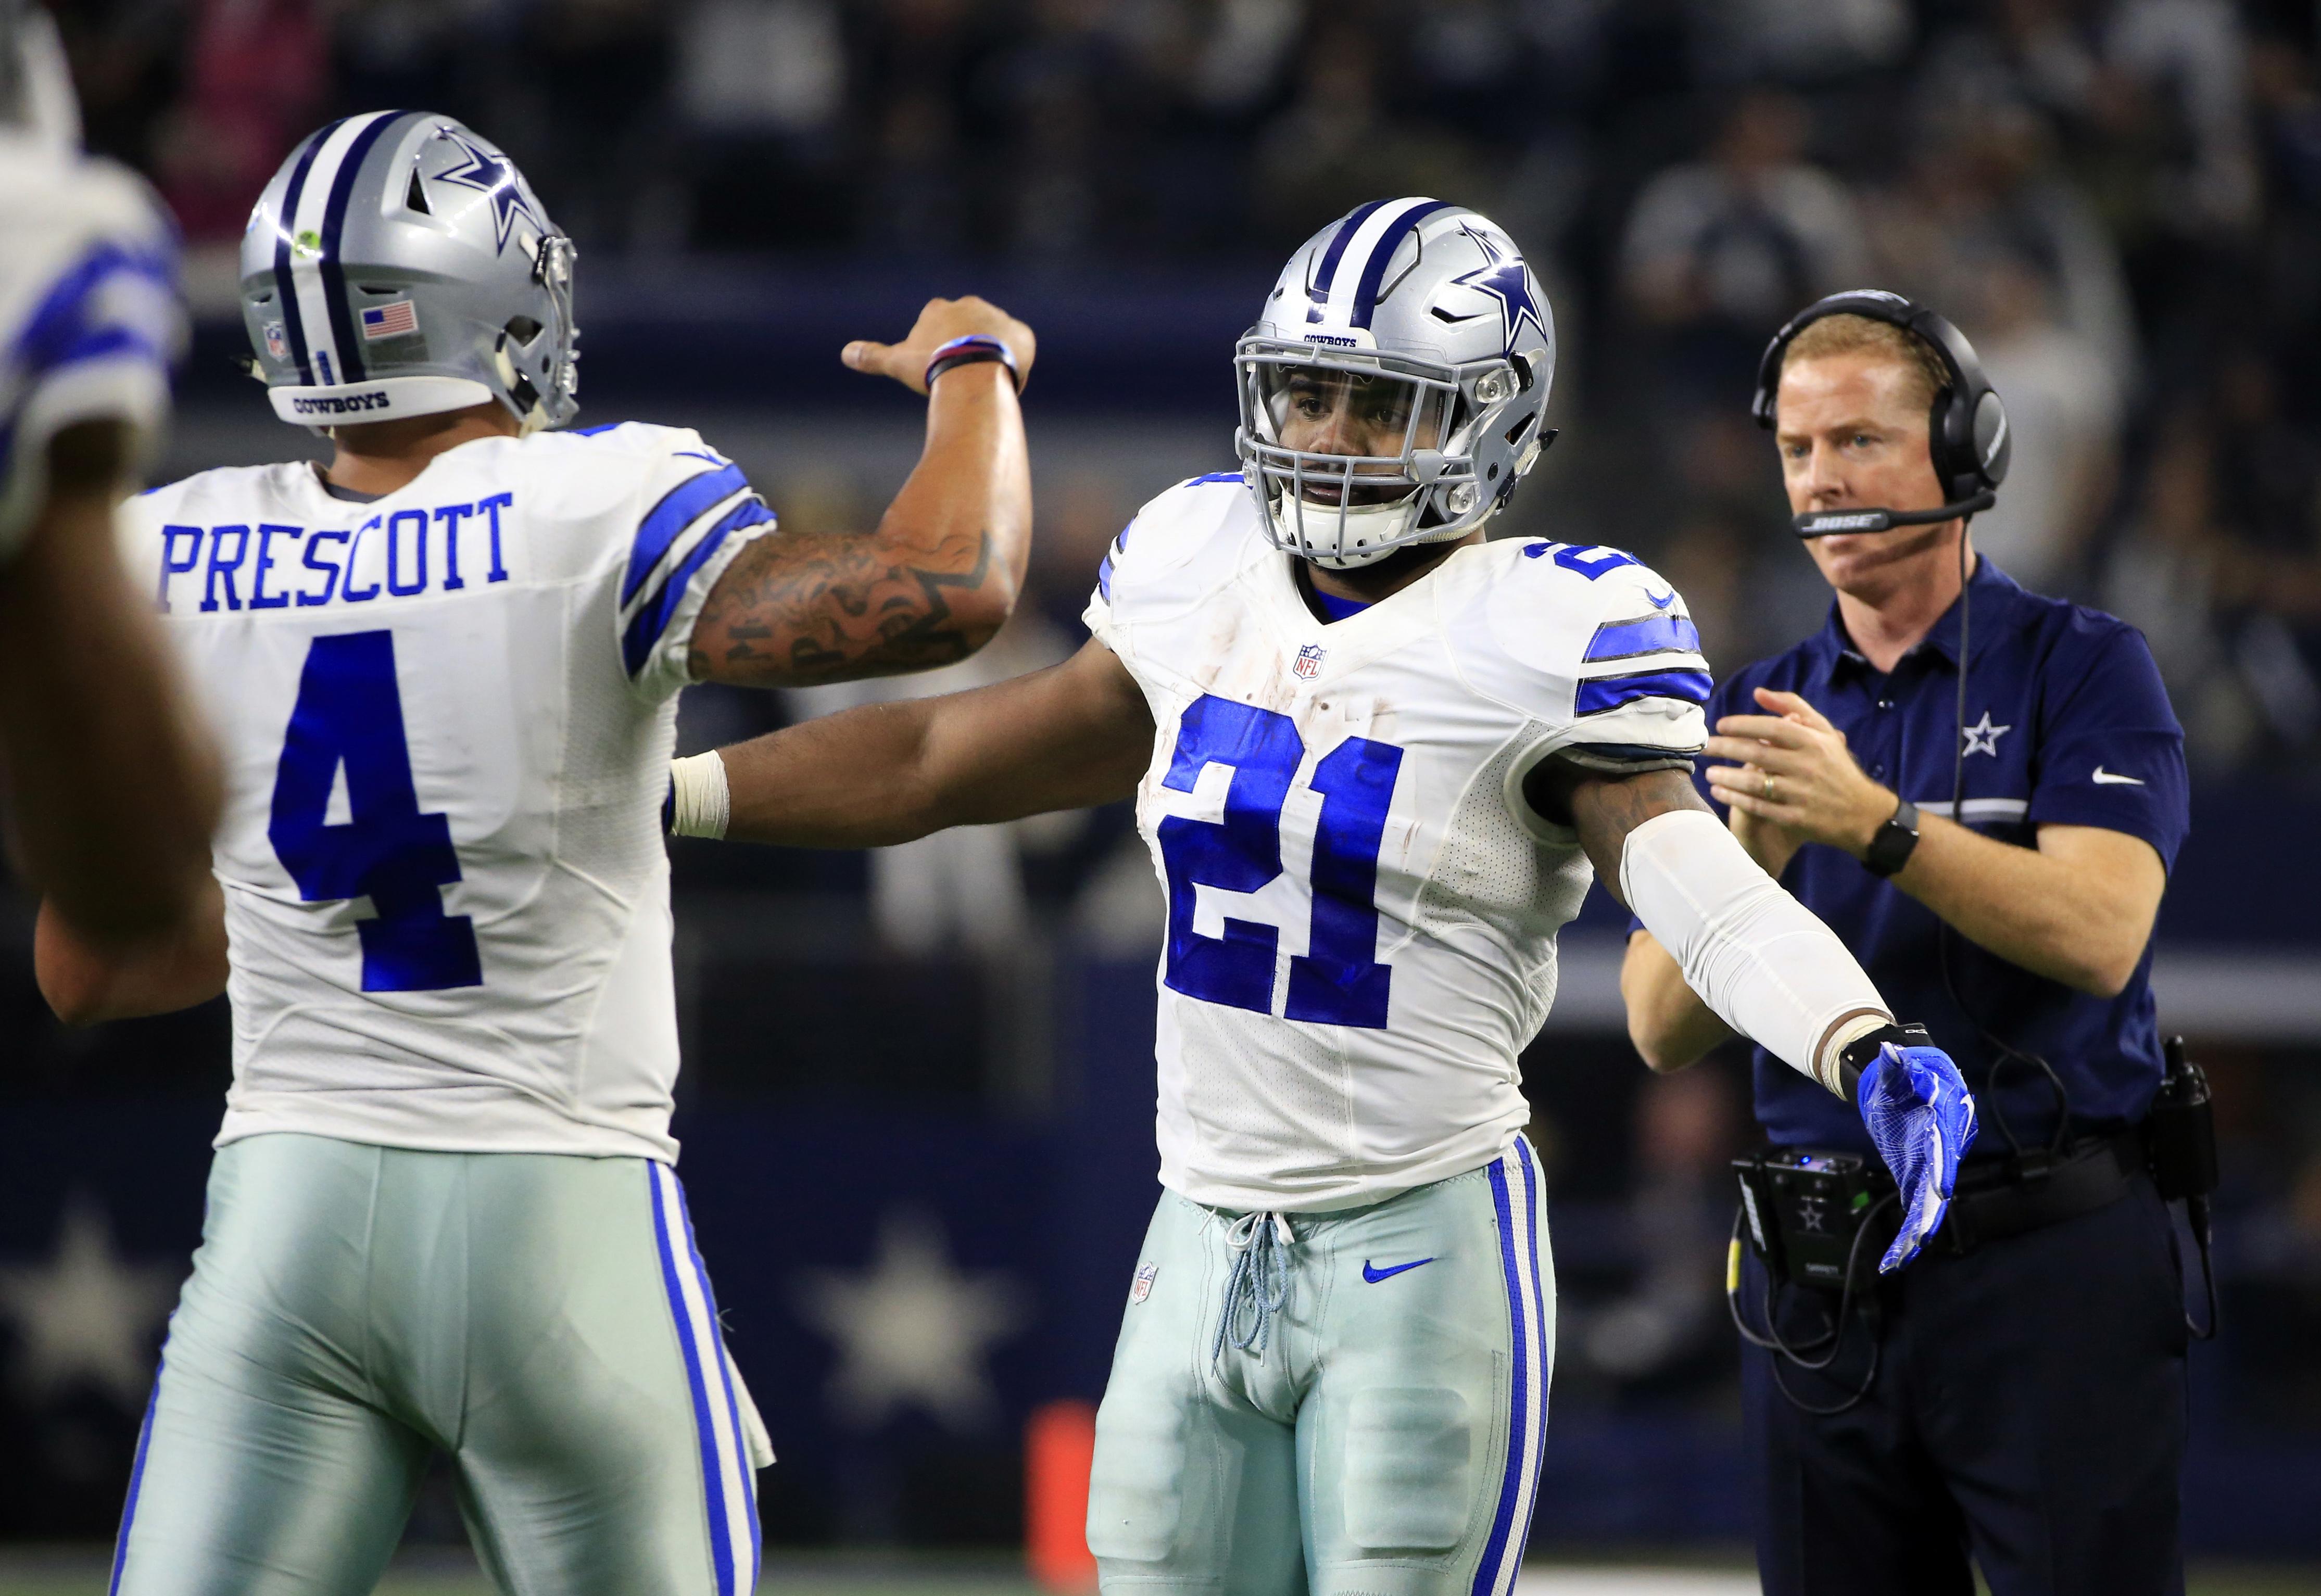 Dallas Cowboys' Dak Prescott (4) is congratulated on his touchdown run by Ezekiel Elliott (21) in the first half of an NFL football game against the Tampa Bay Buccaneers as head coach Jason Garrett, right, watches, , Sunday, Dec. 18, 2016, in Arlington, T